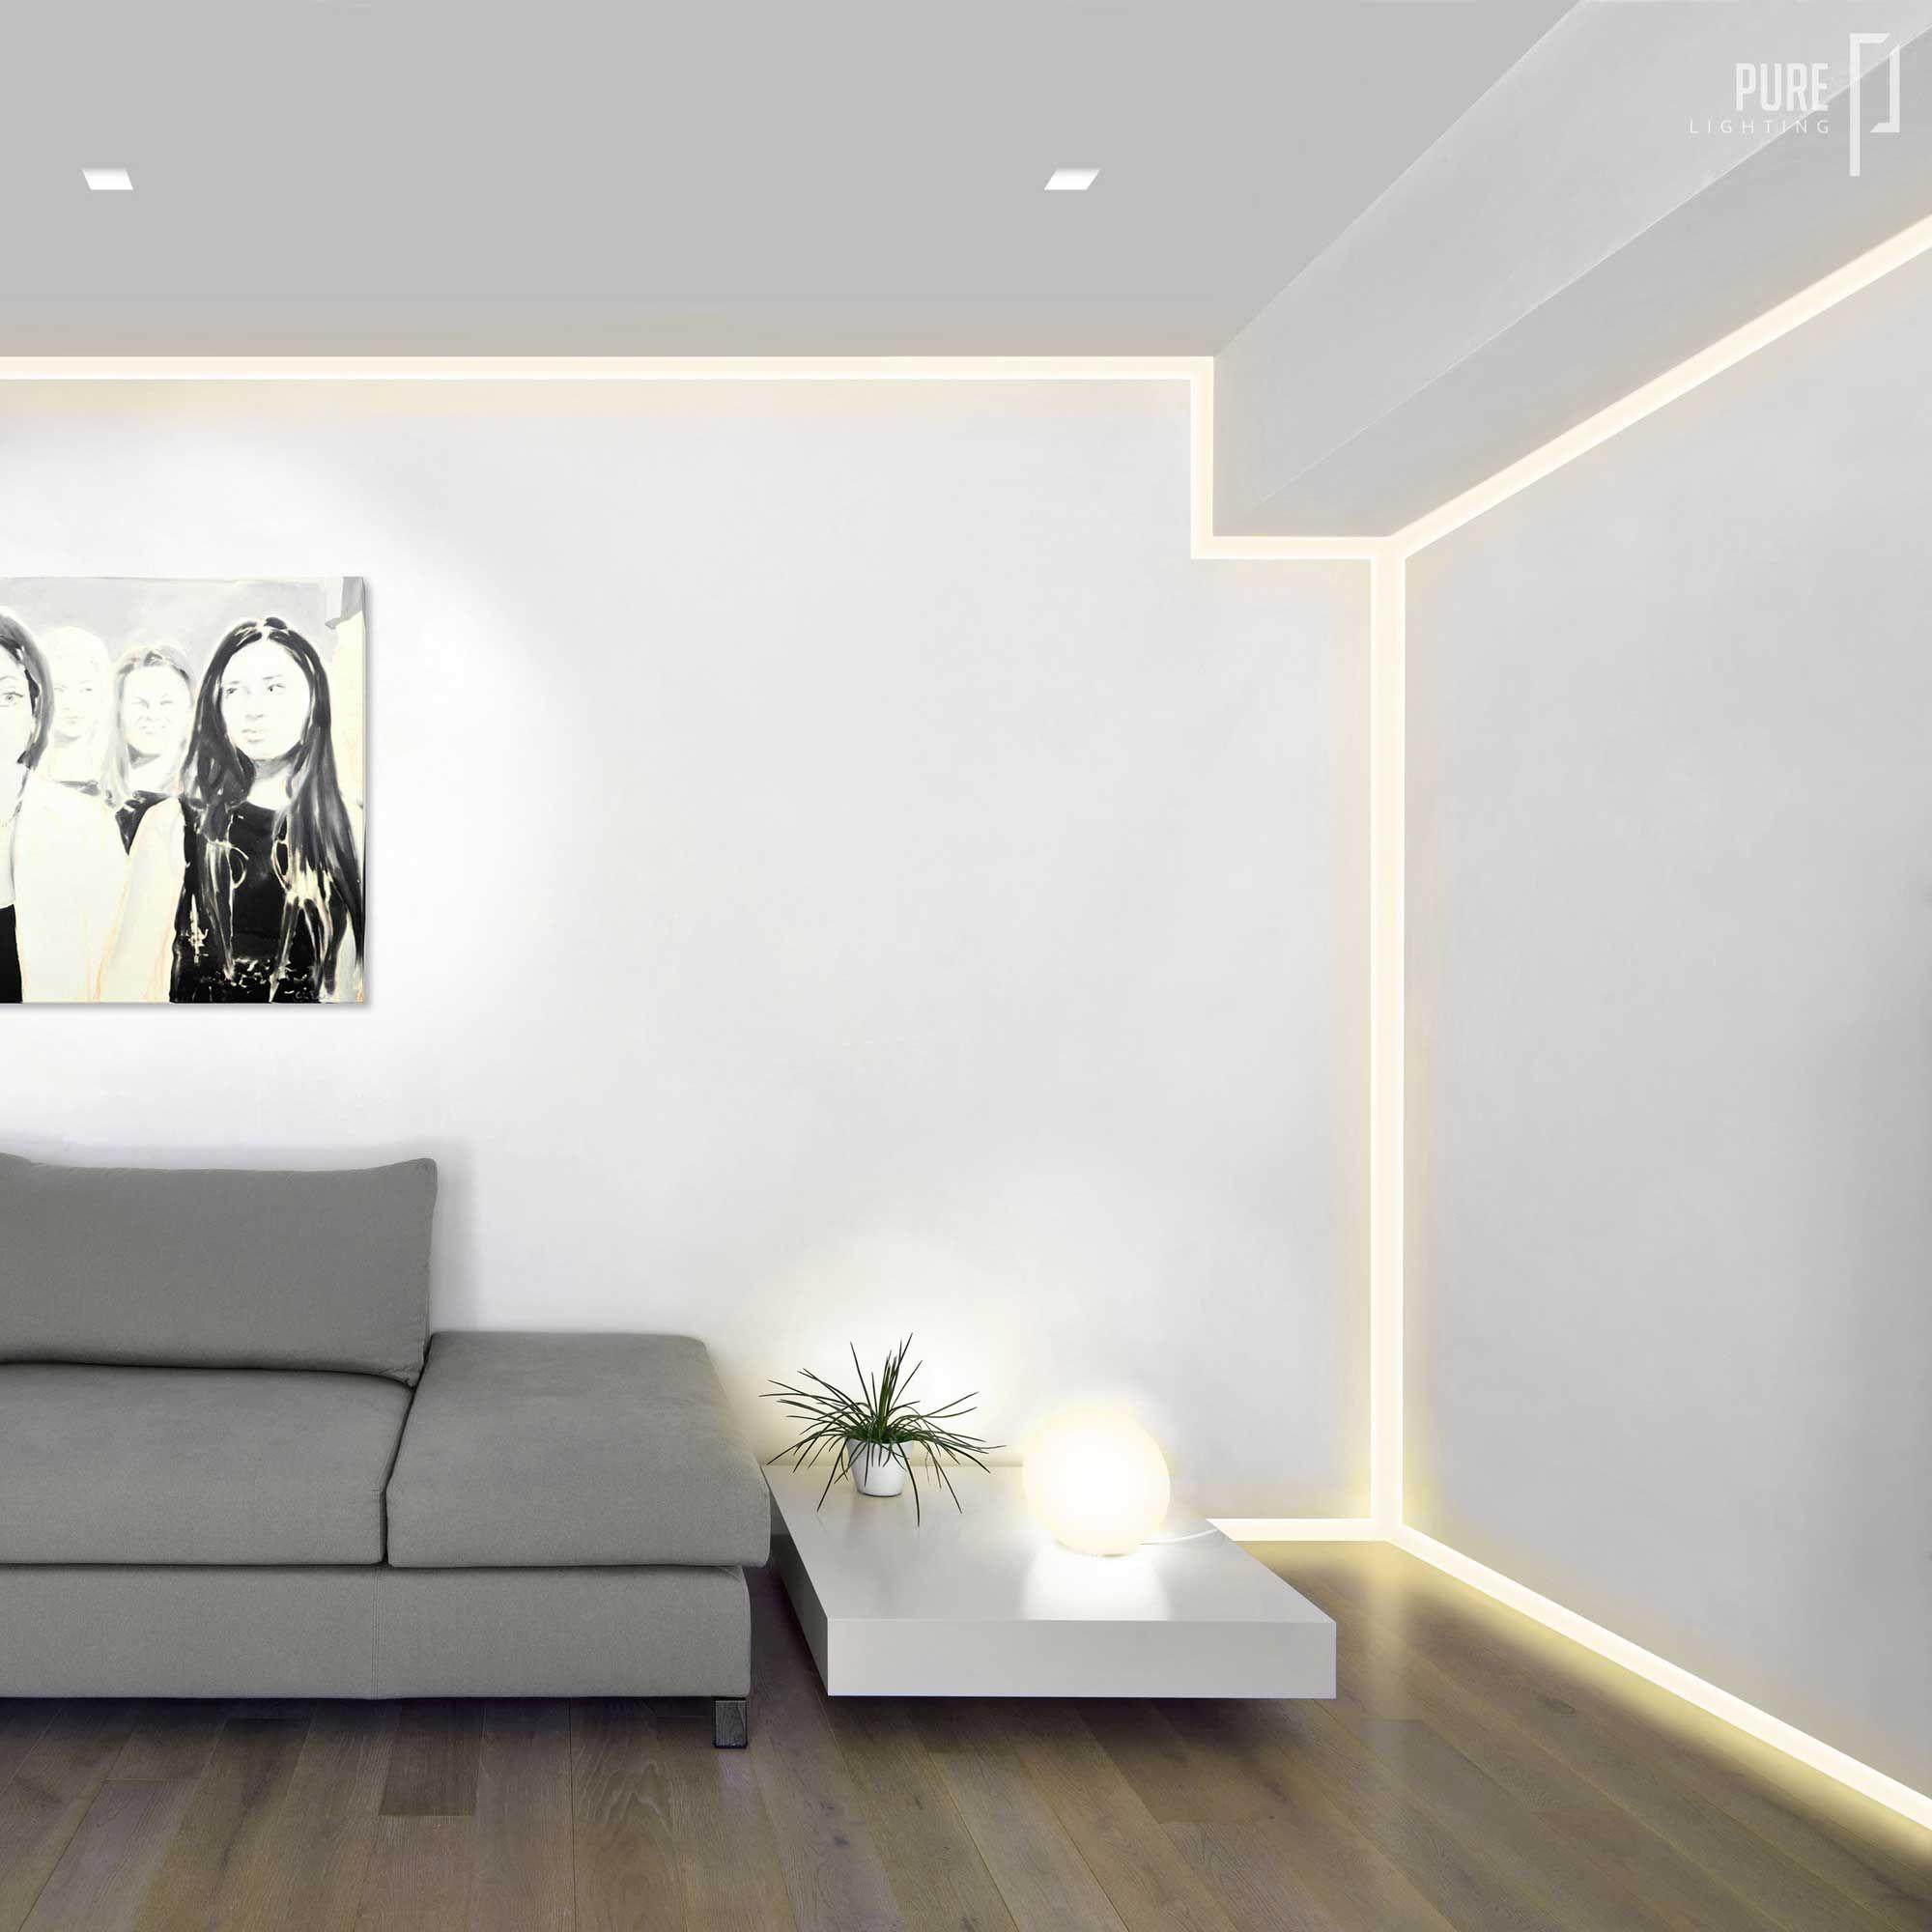 Verge plaster in led system provides illumination to for Living room 2700k or 3000k